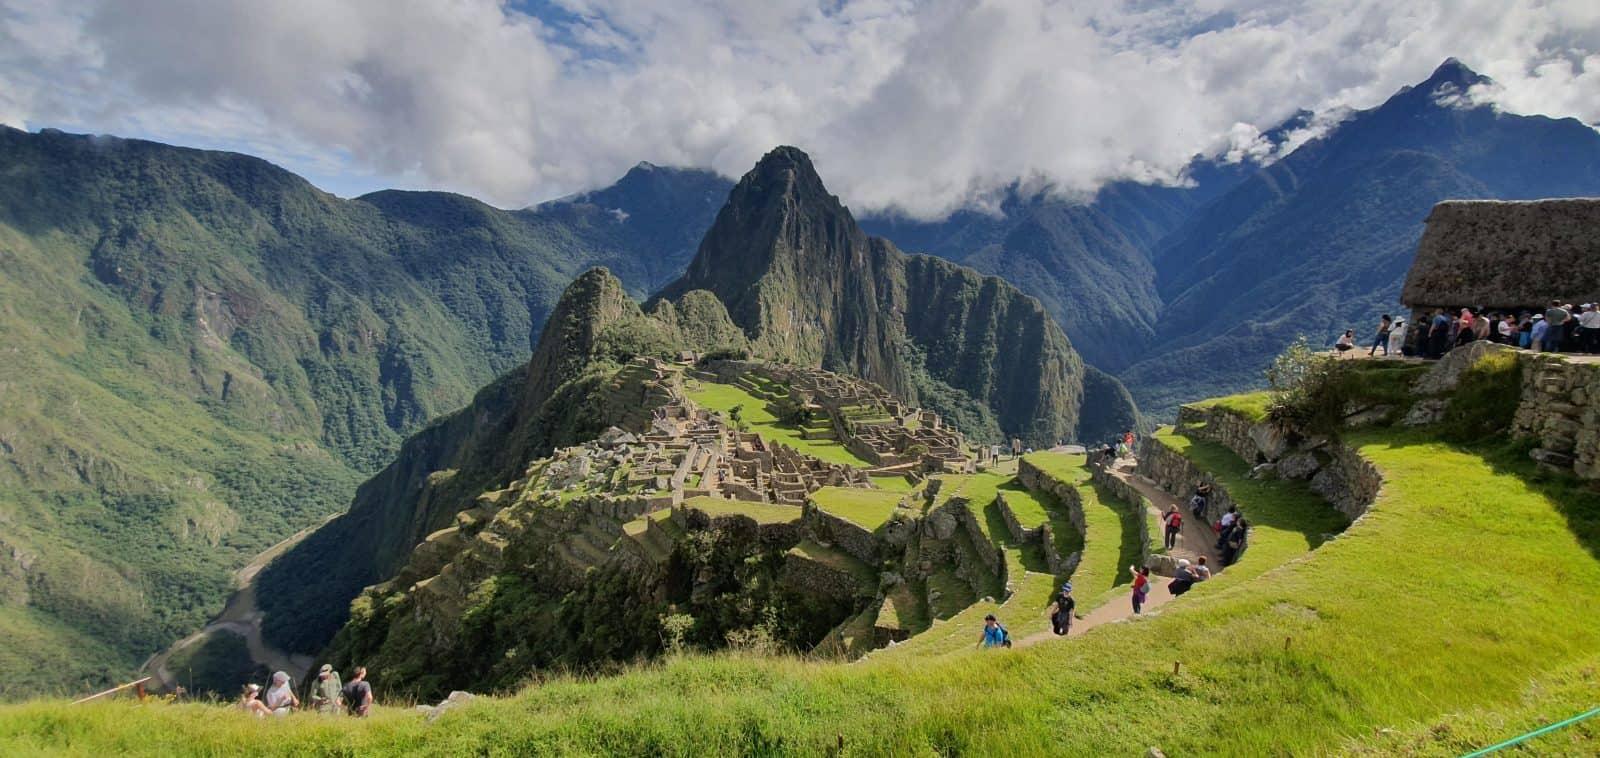 Photo of Macchu Pichu with Huayna Pichu in the back